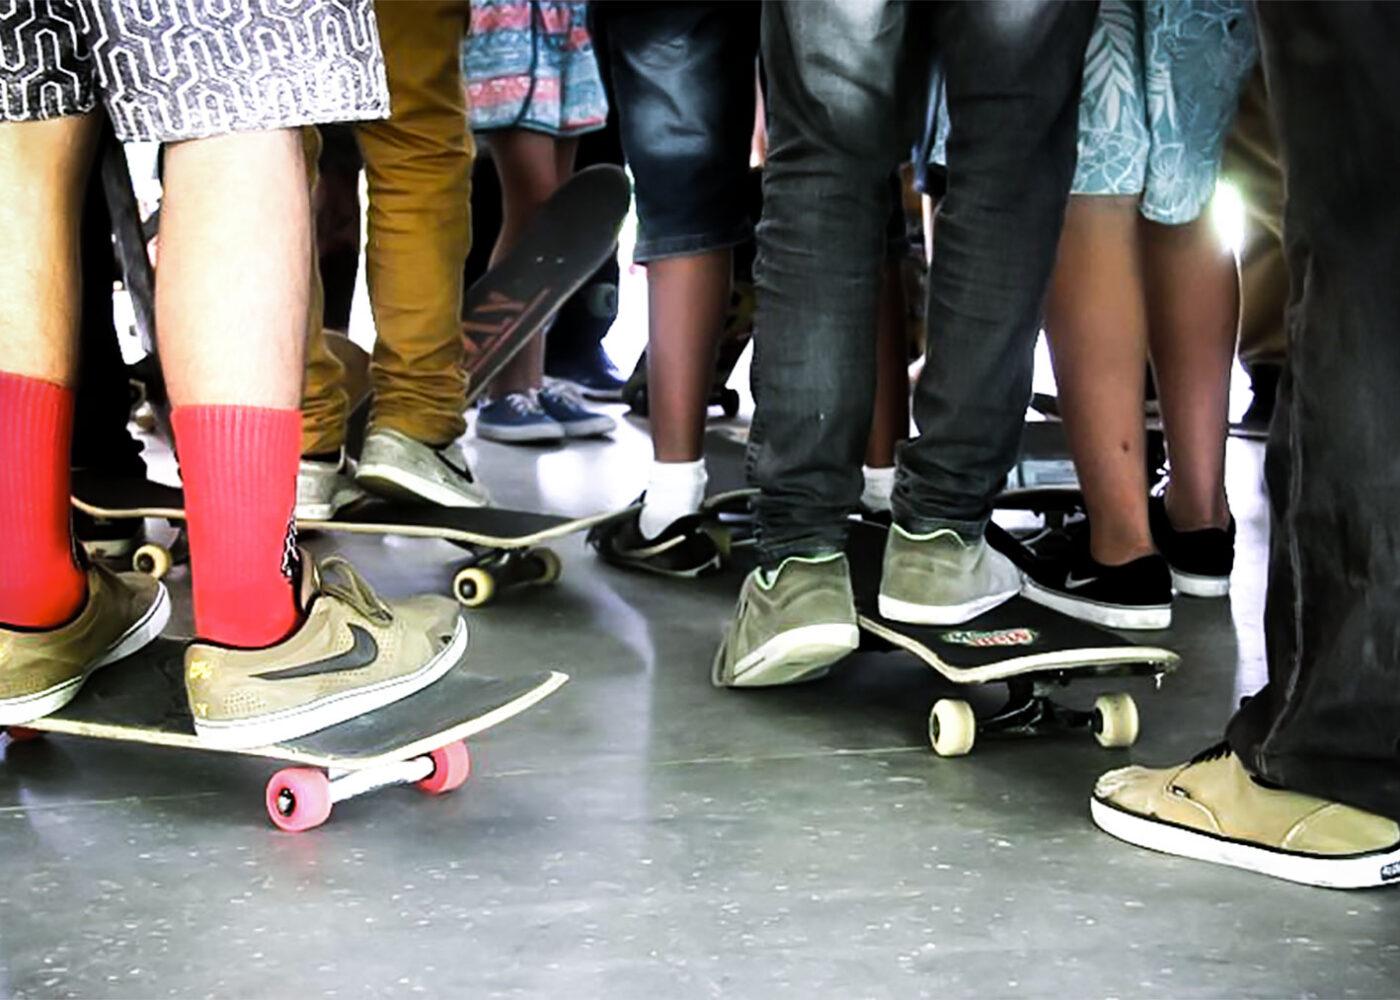 Christian Skaters International Photo by Ericson Cezar